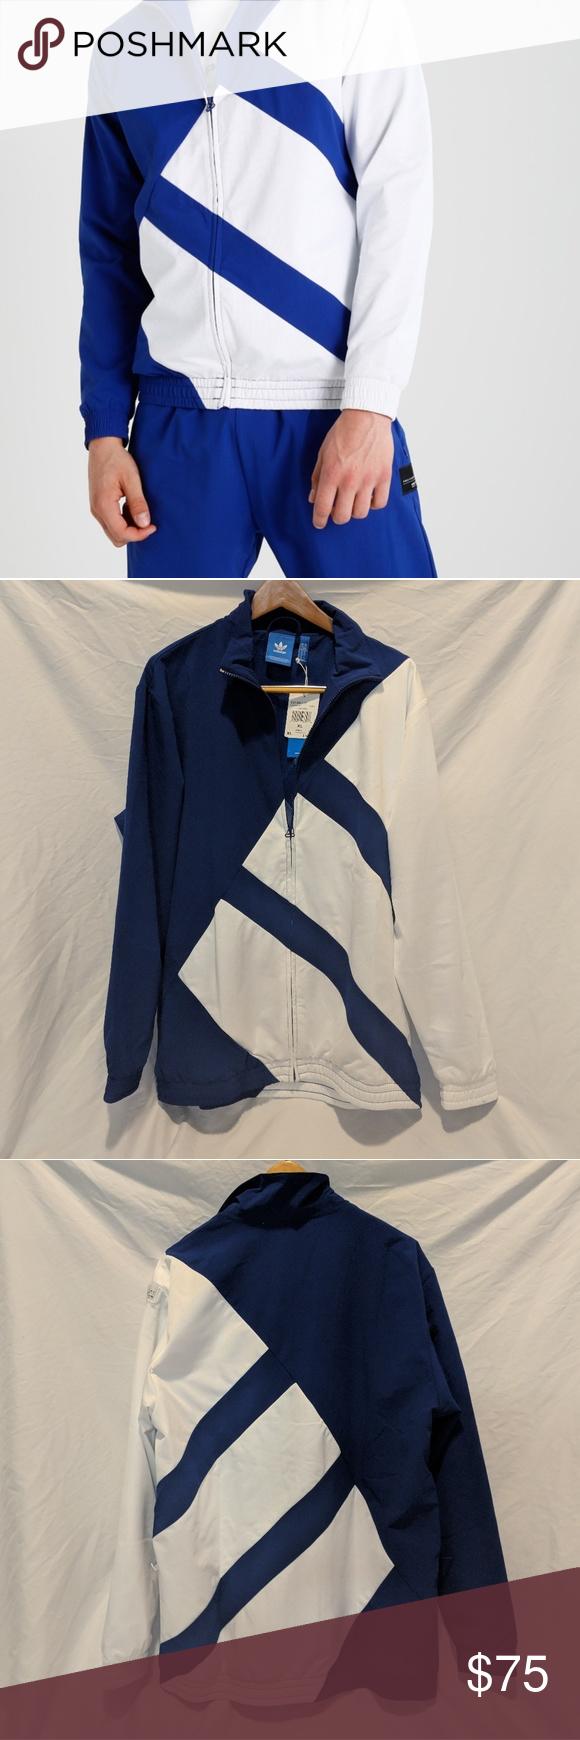 4eb14230e714 Adidas EQT ADV Track Jacket  BRAND NEW   NEVER WORN  Blue White Track Jacket.  Very Nice Quality adidas Jackets   Coats Performance Jackets